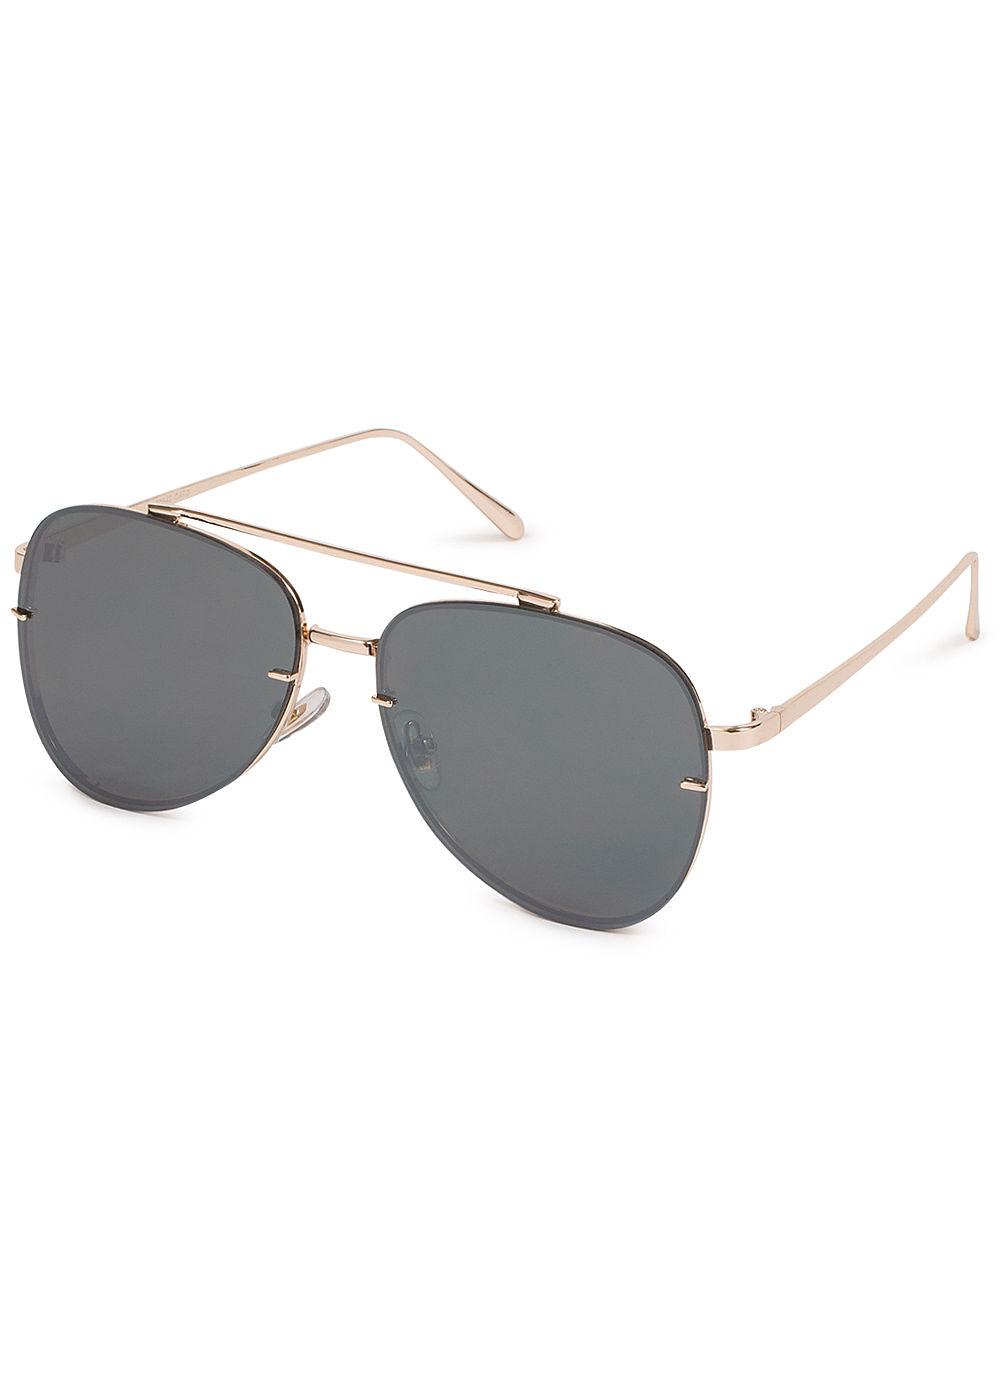 seventyseven lifestyle damen sonnenbrille uv schutz 400 gold gr n 77onlineshop. Black Bedroom Furniture Sets. Home Design Ideas